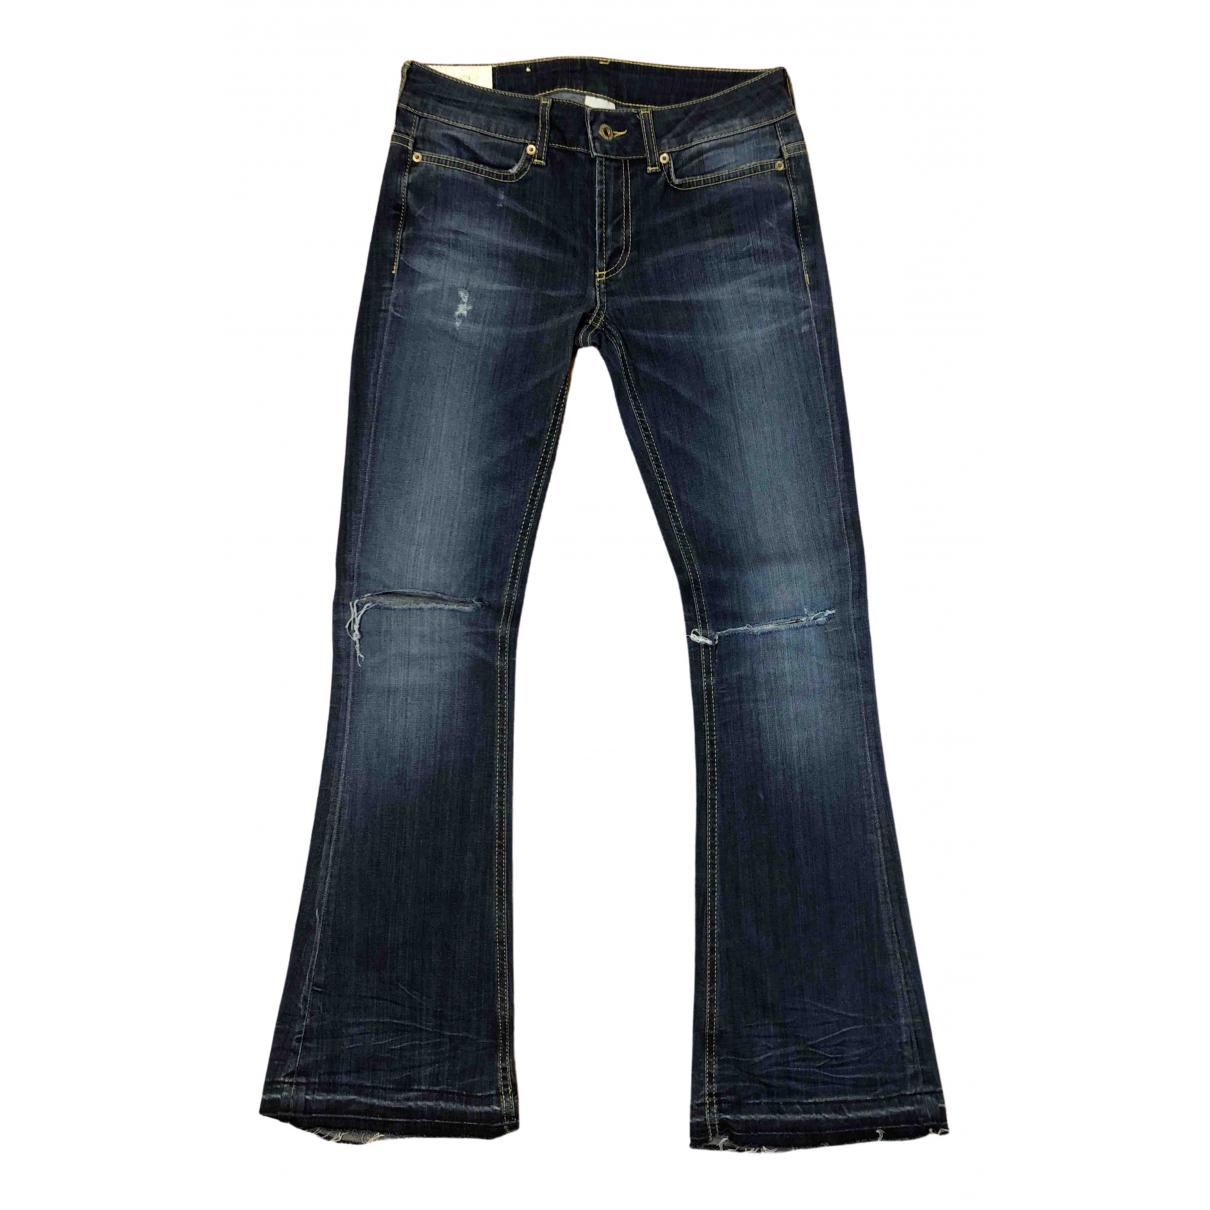 Dondup N Blue Denim - Jeans Jeans for Women 26 US